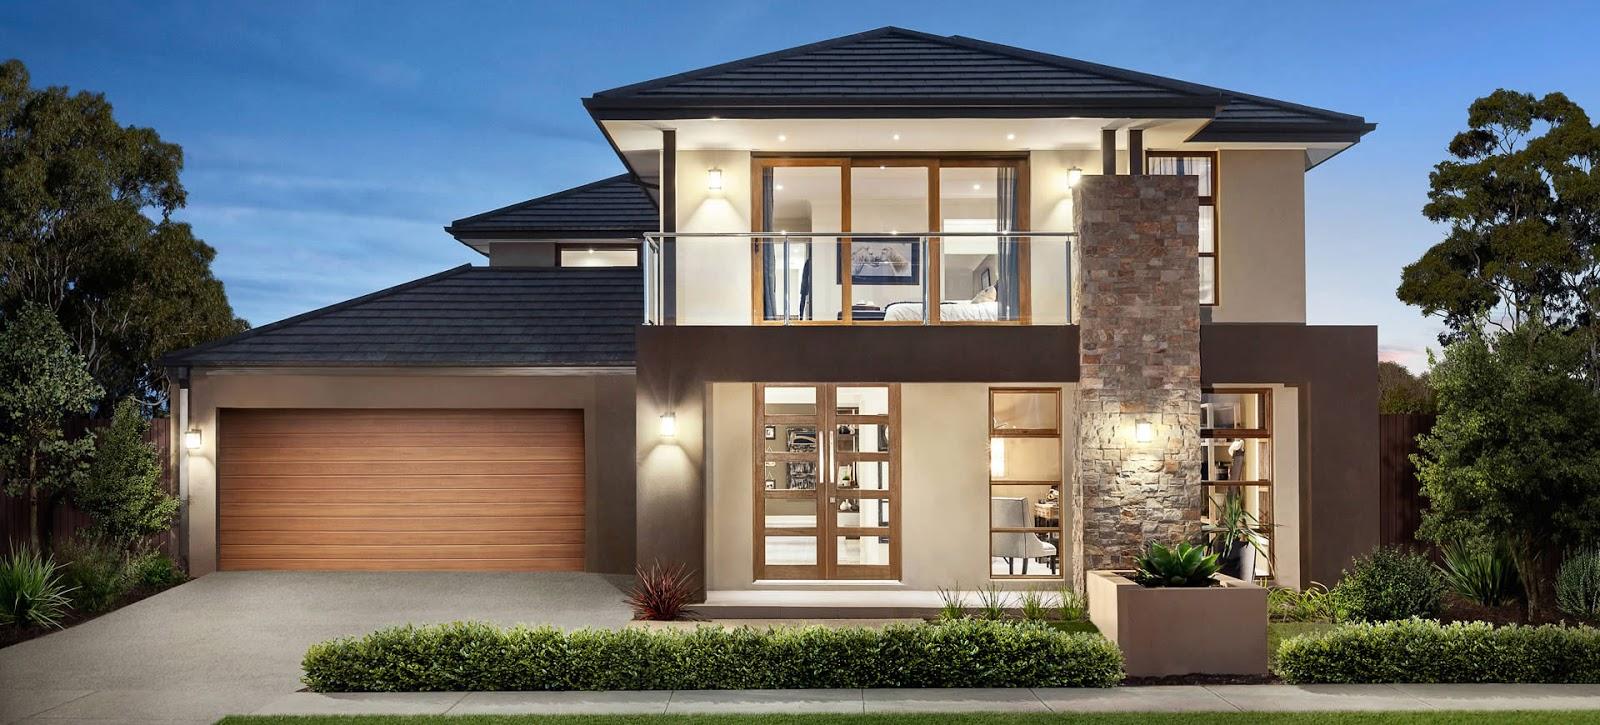 Good Home Design Ideas: ΤΡΟΧΟΒΙΛΕΣ